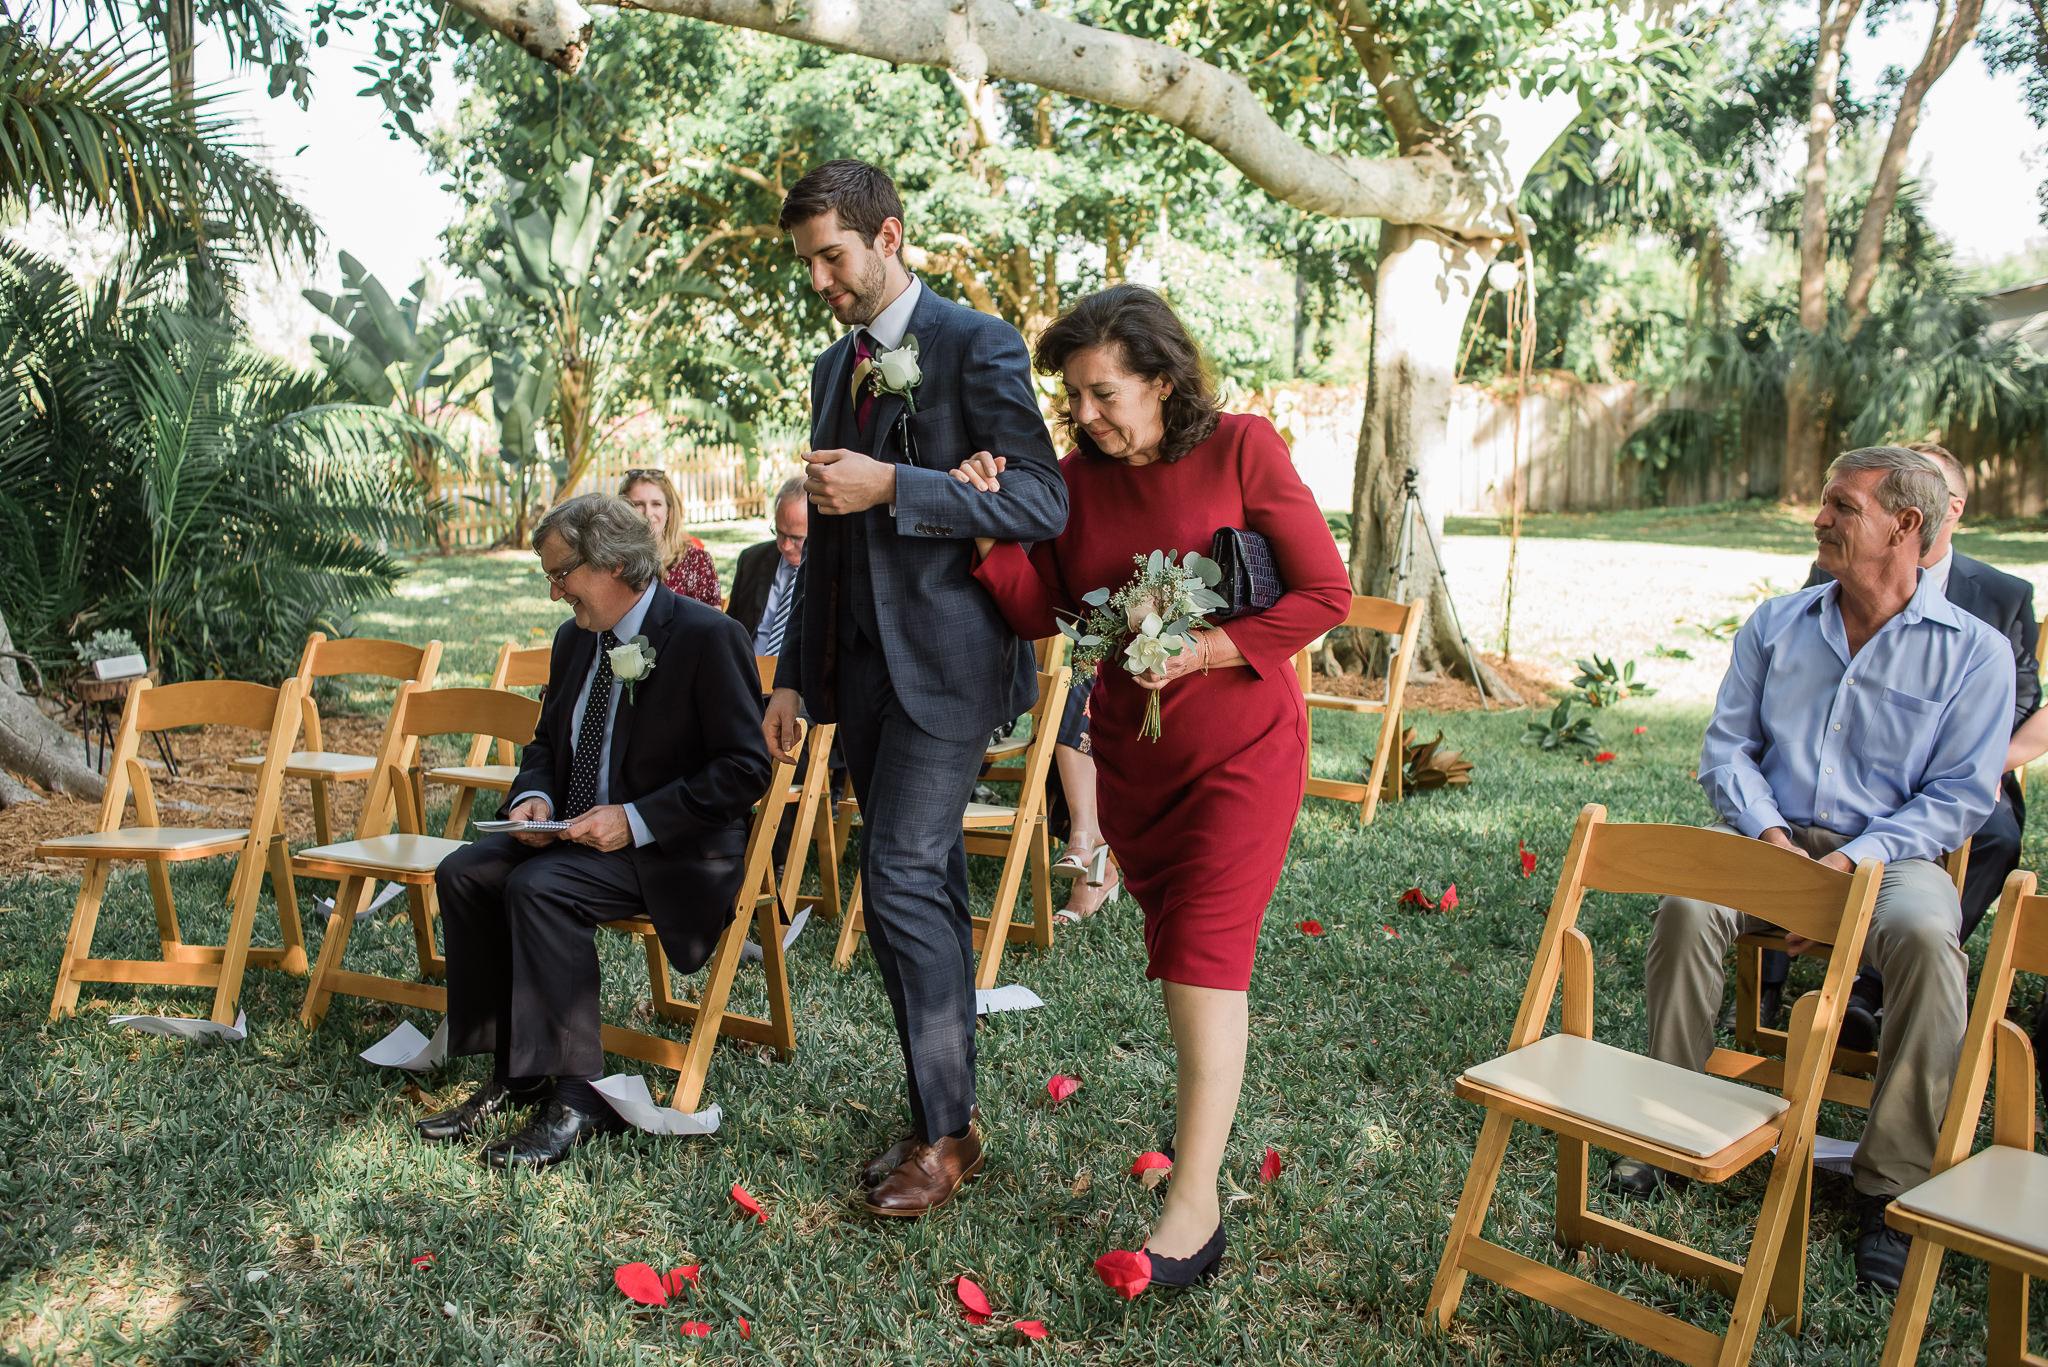 TAMPA_WEDDING_PHOTOGRAPHER_AKMZ_BANYON_GROVE_8.jpg